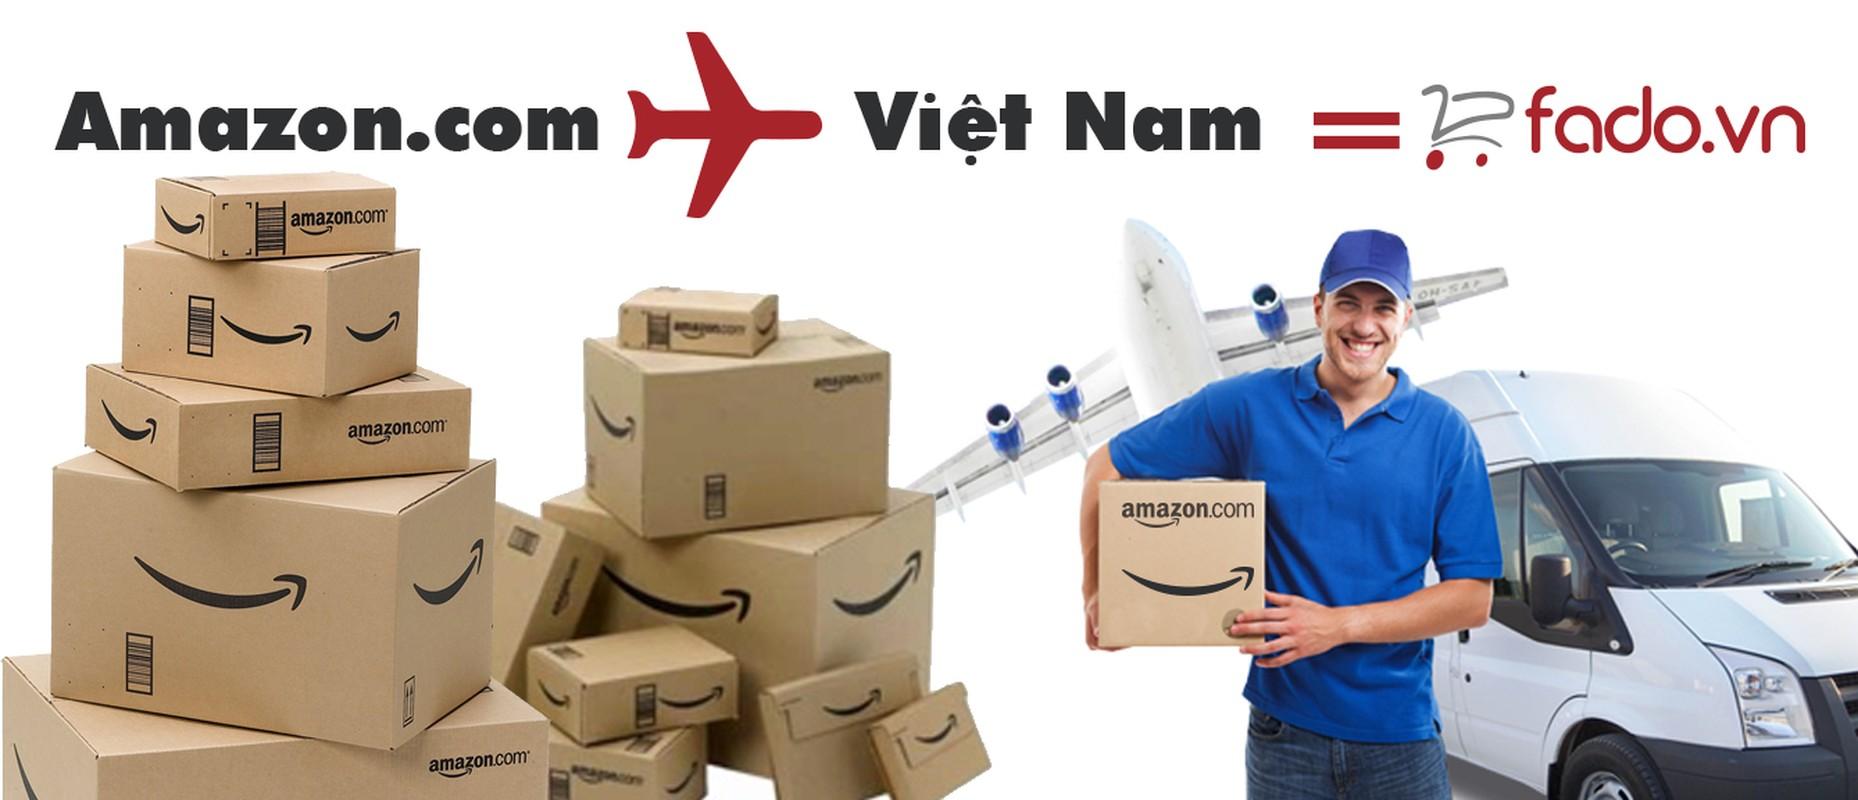 Thu thuat san hang re ngay Black Friday tai Viet Nam-Hinh-3